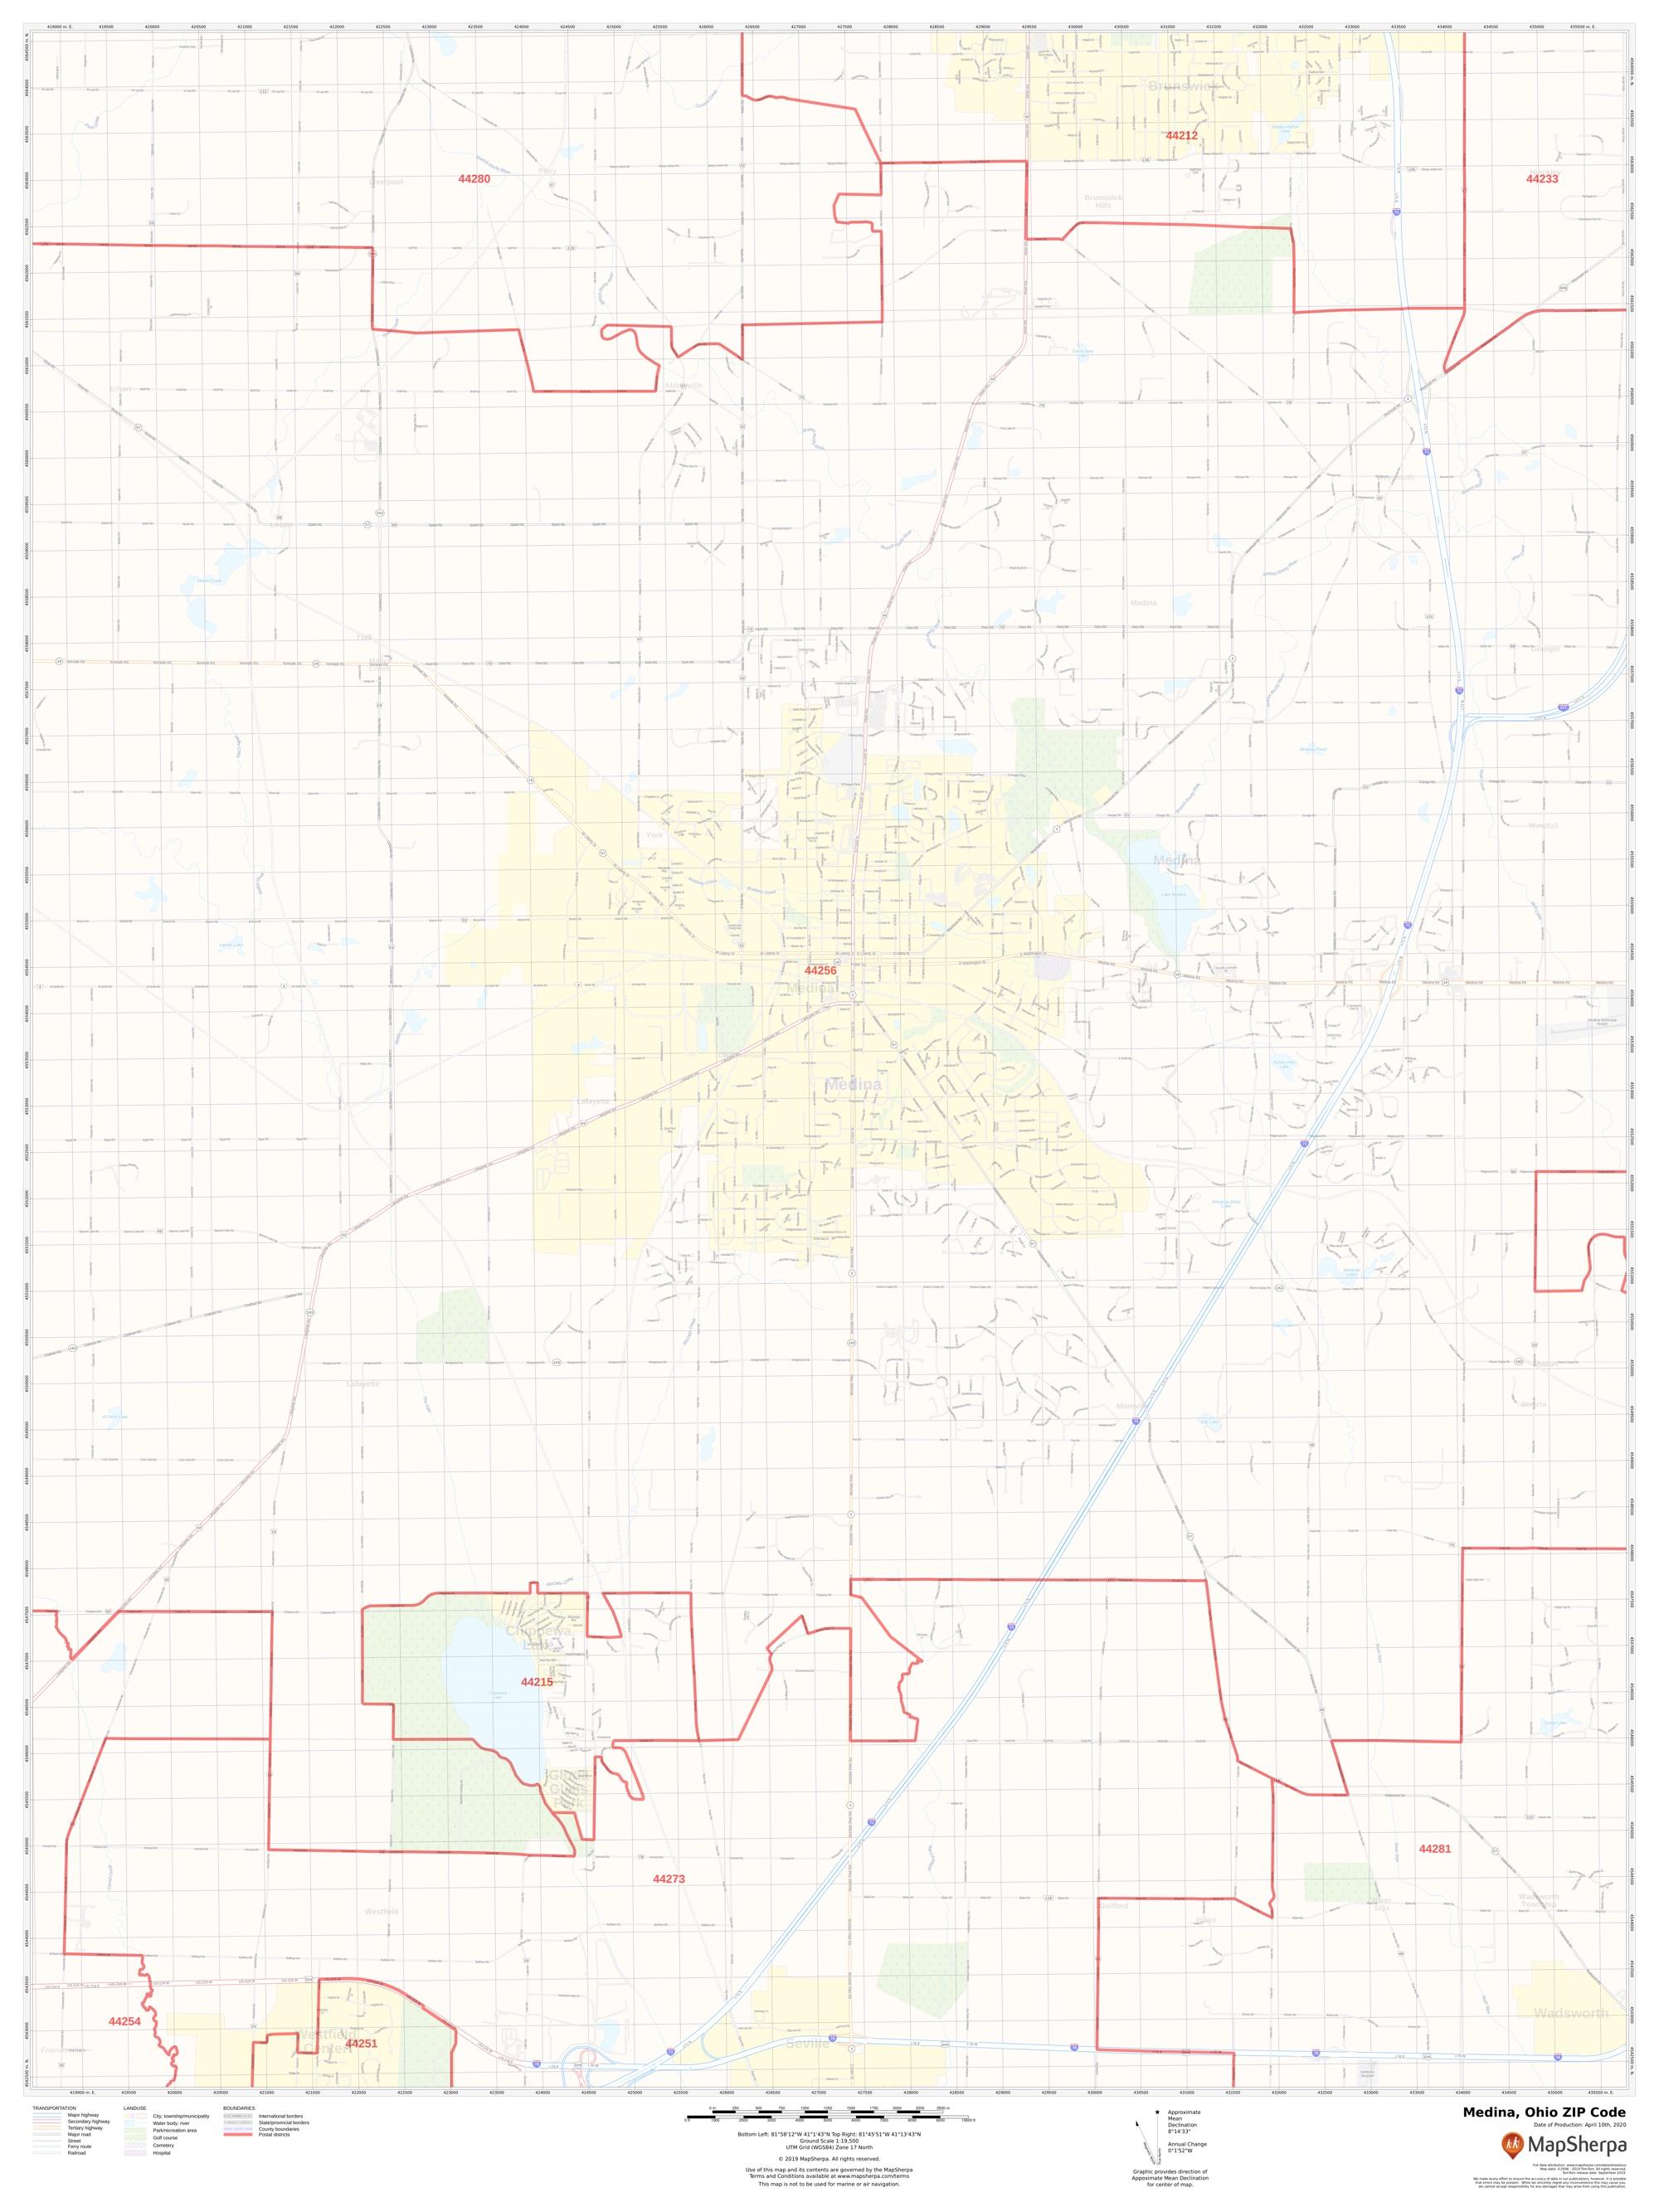 Picture of: Medina Ohio Zip Code Map